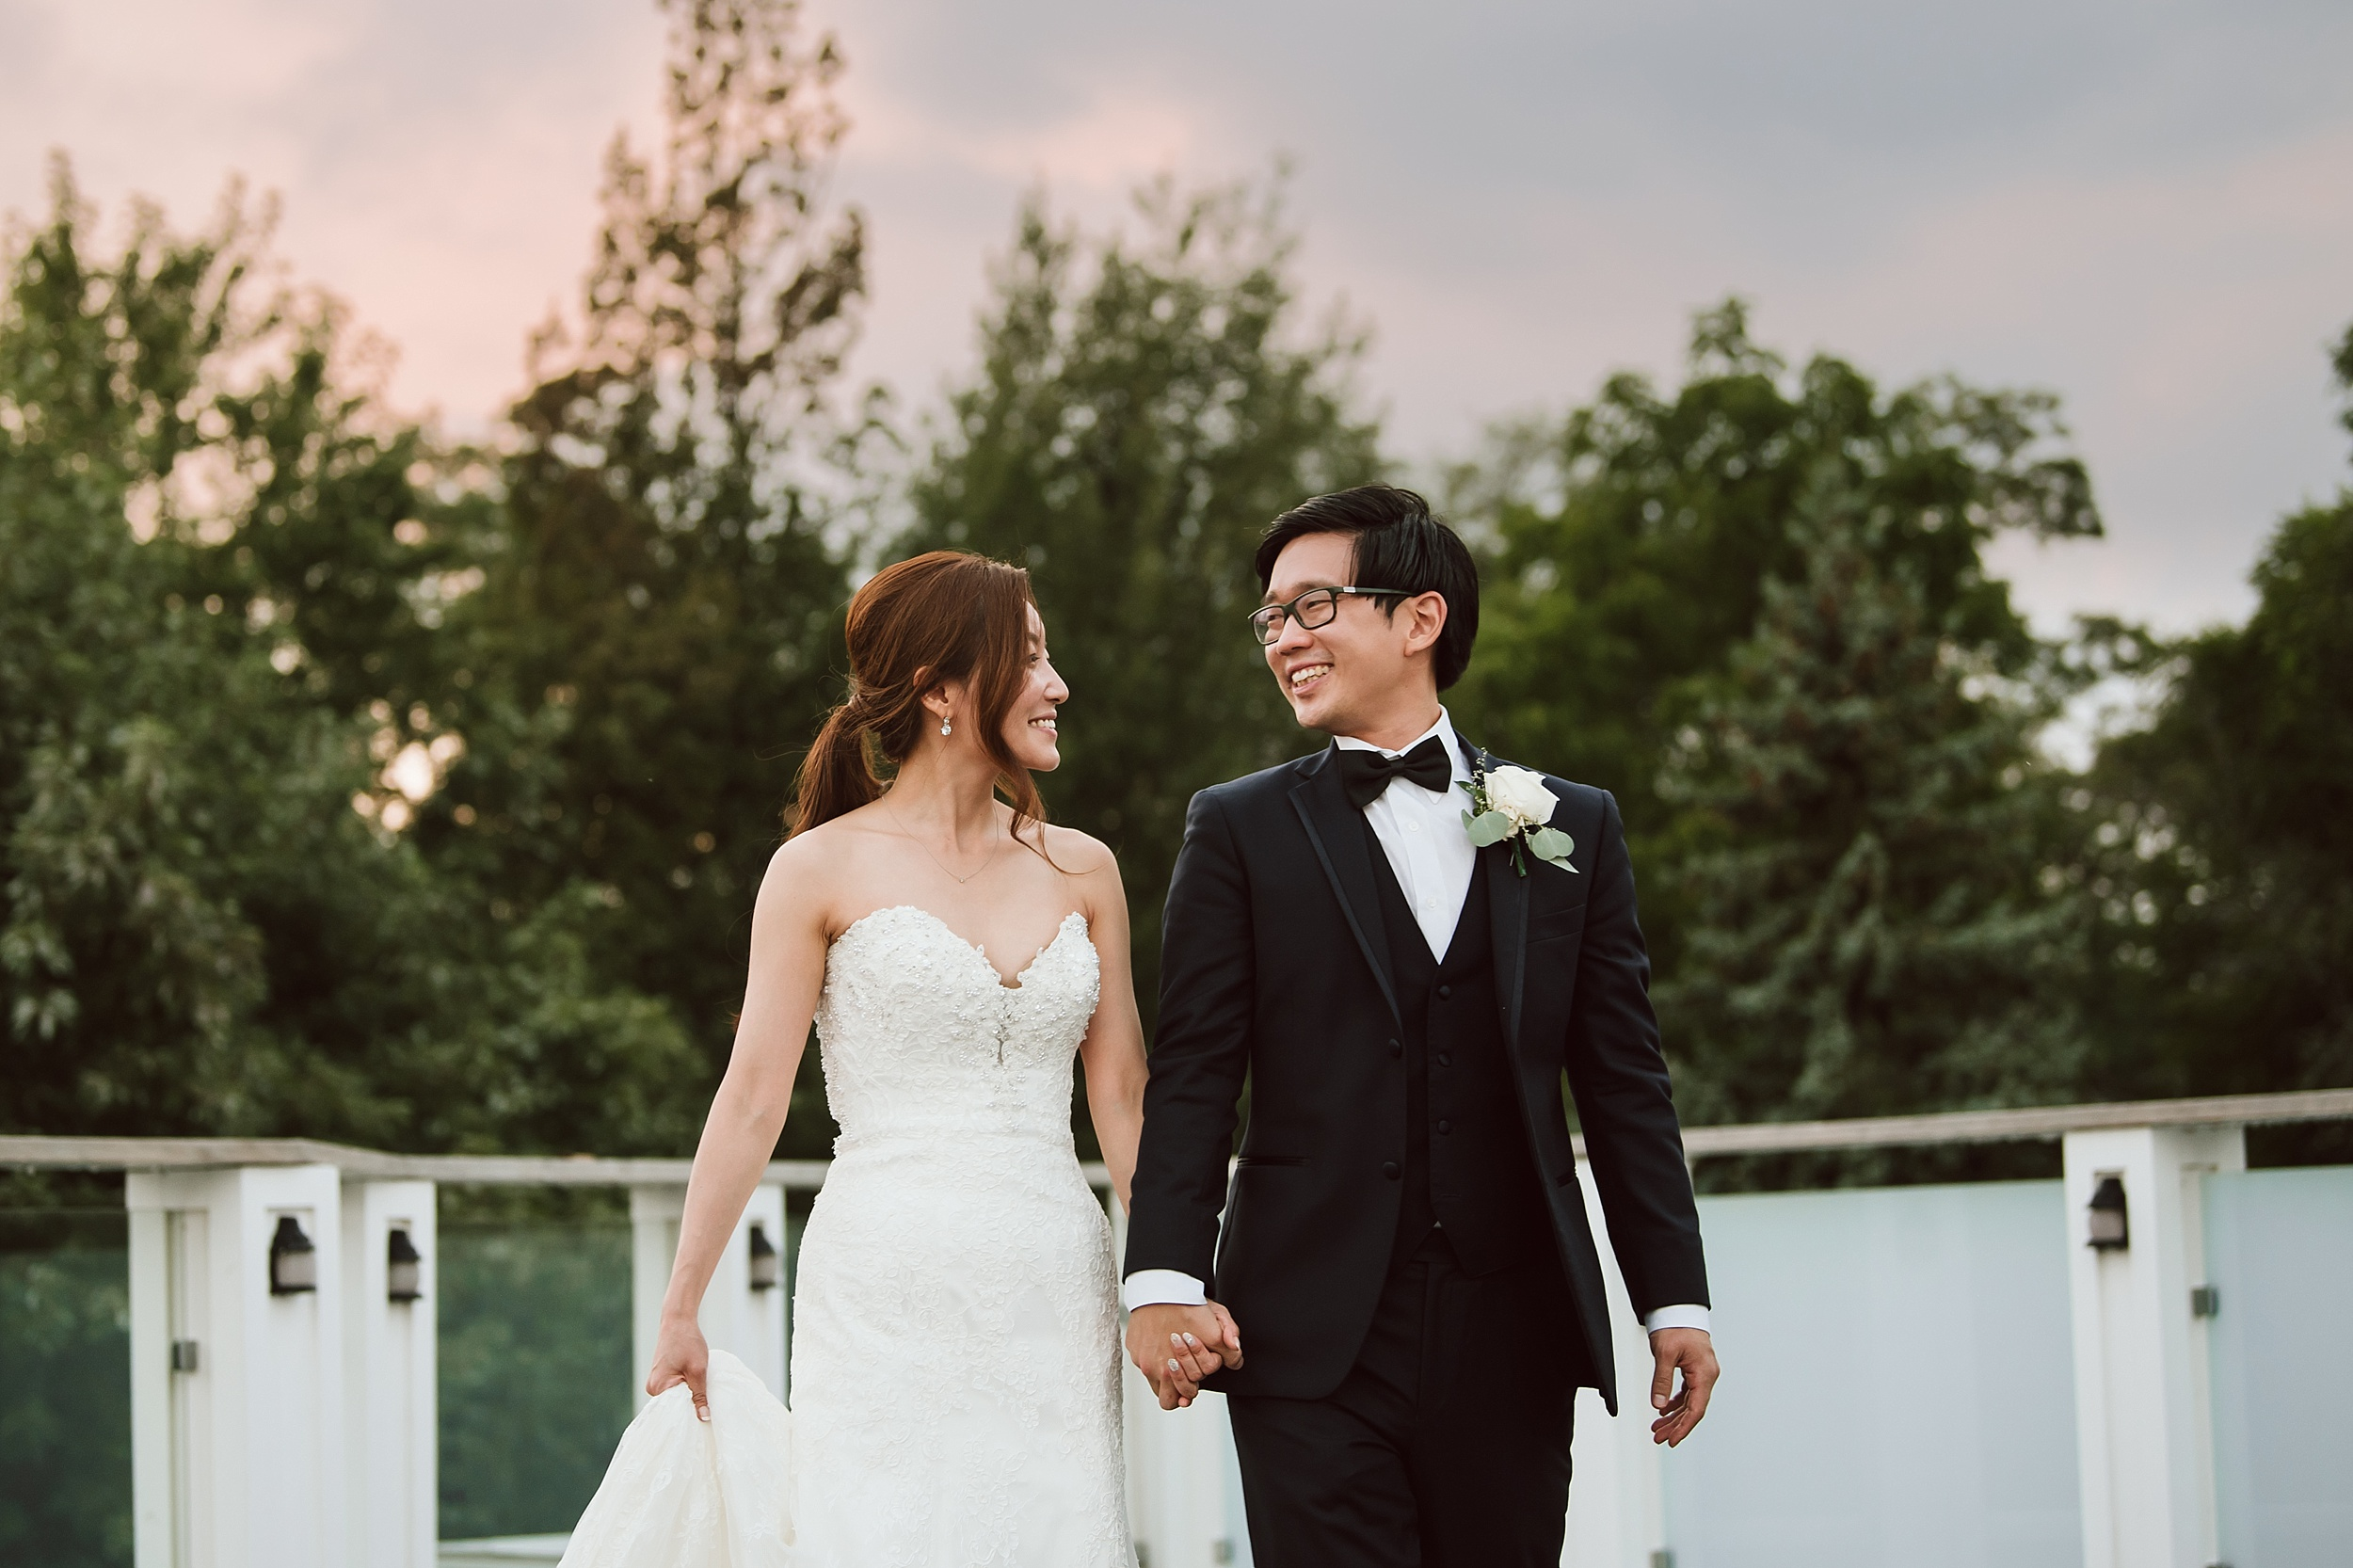 Doctors_House_Kleinburg_Wedding_Toronto_Photographer_0058.jpg